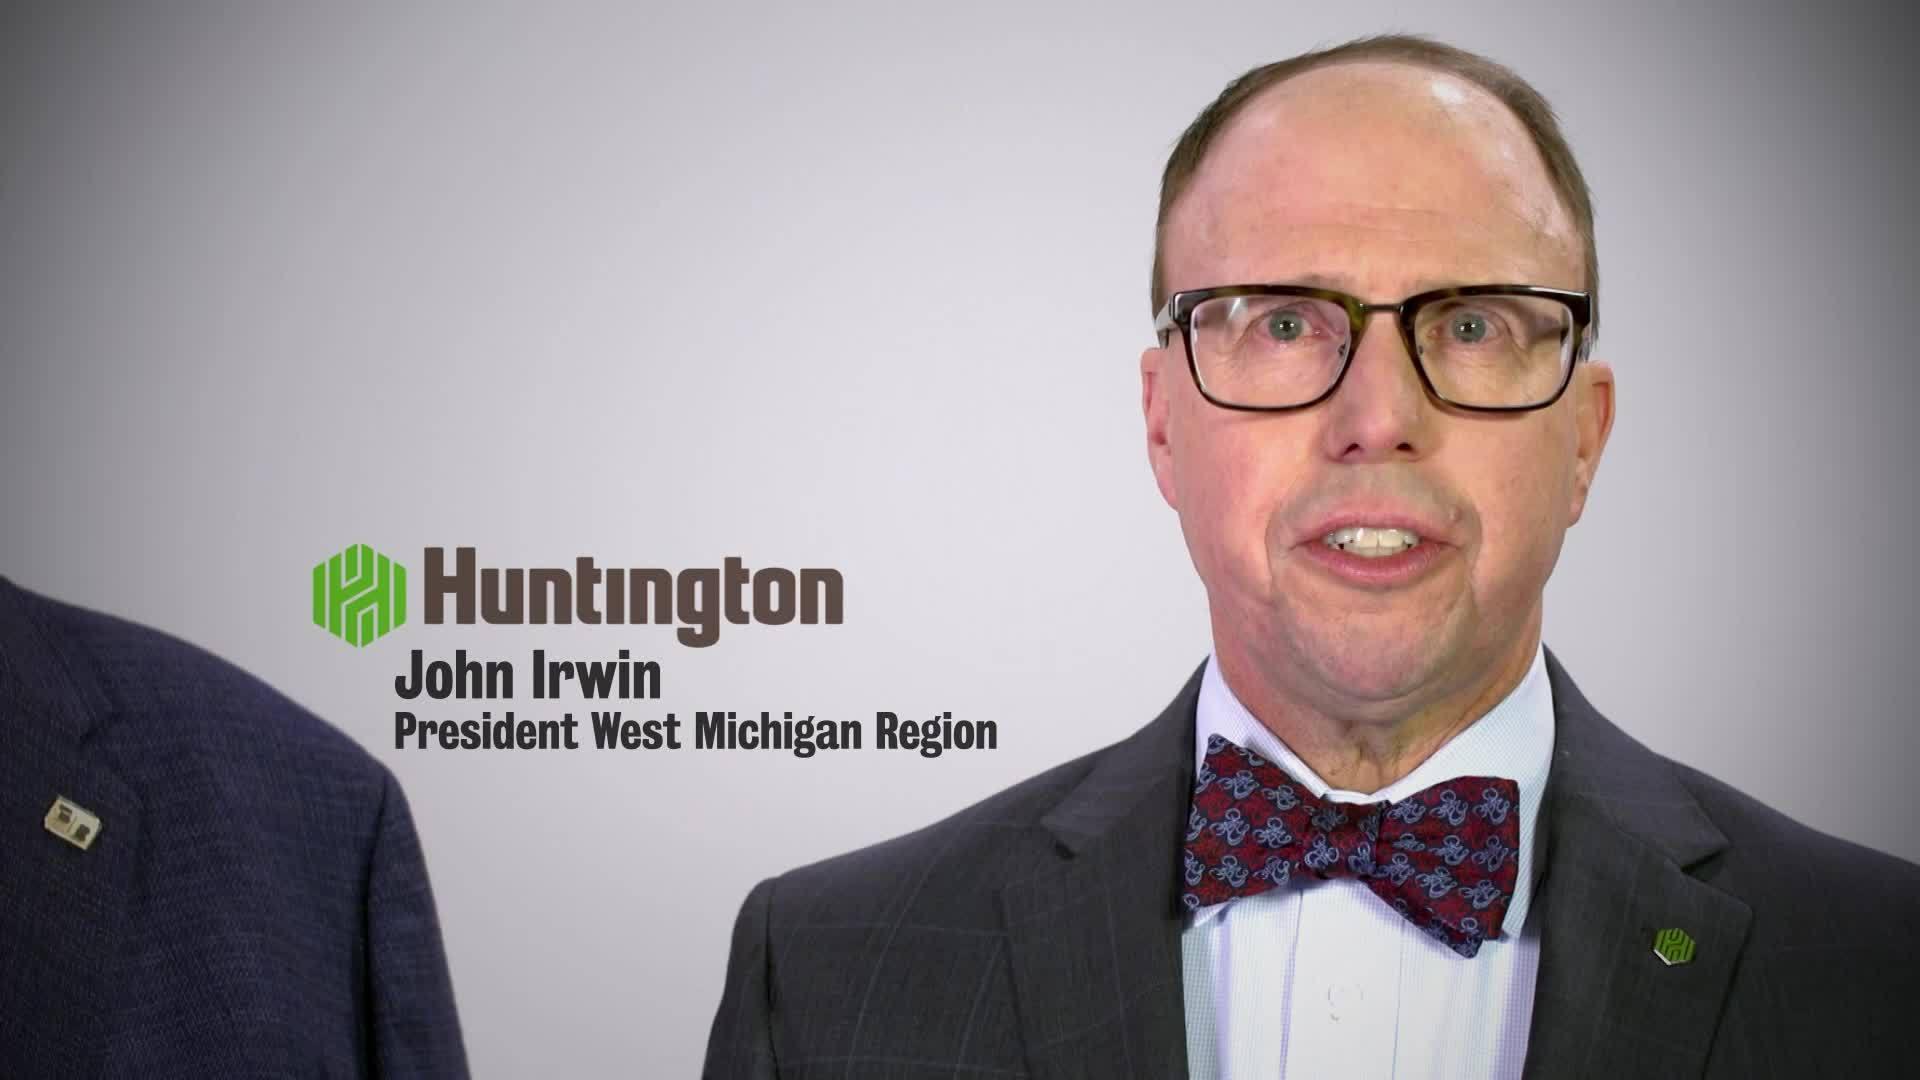 Huntington_Bank_is_helping_the_efforts_o_1_20190215162335